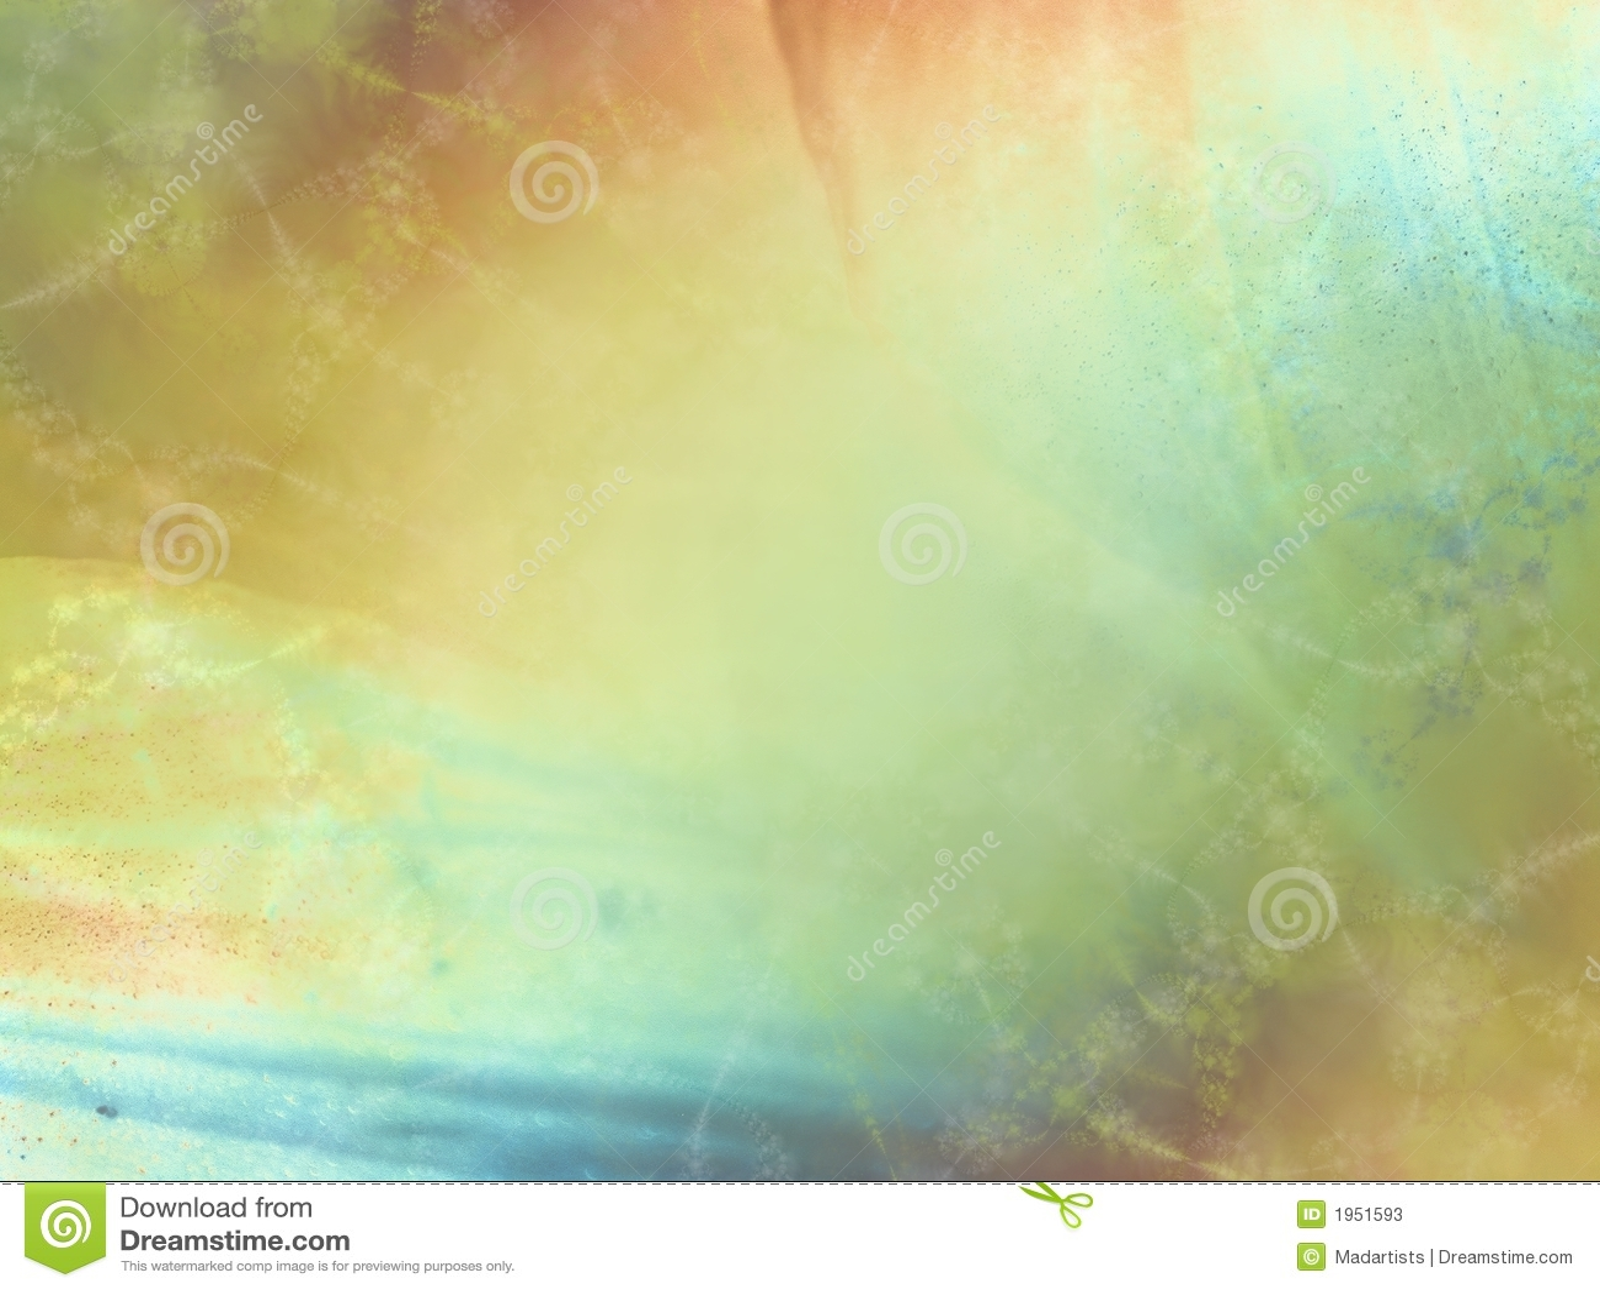 Soft Gold Green Blue Texture Stock Photos - Image: 1951593